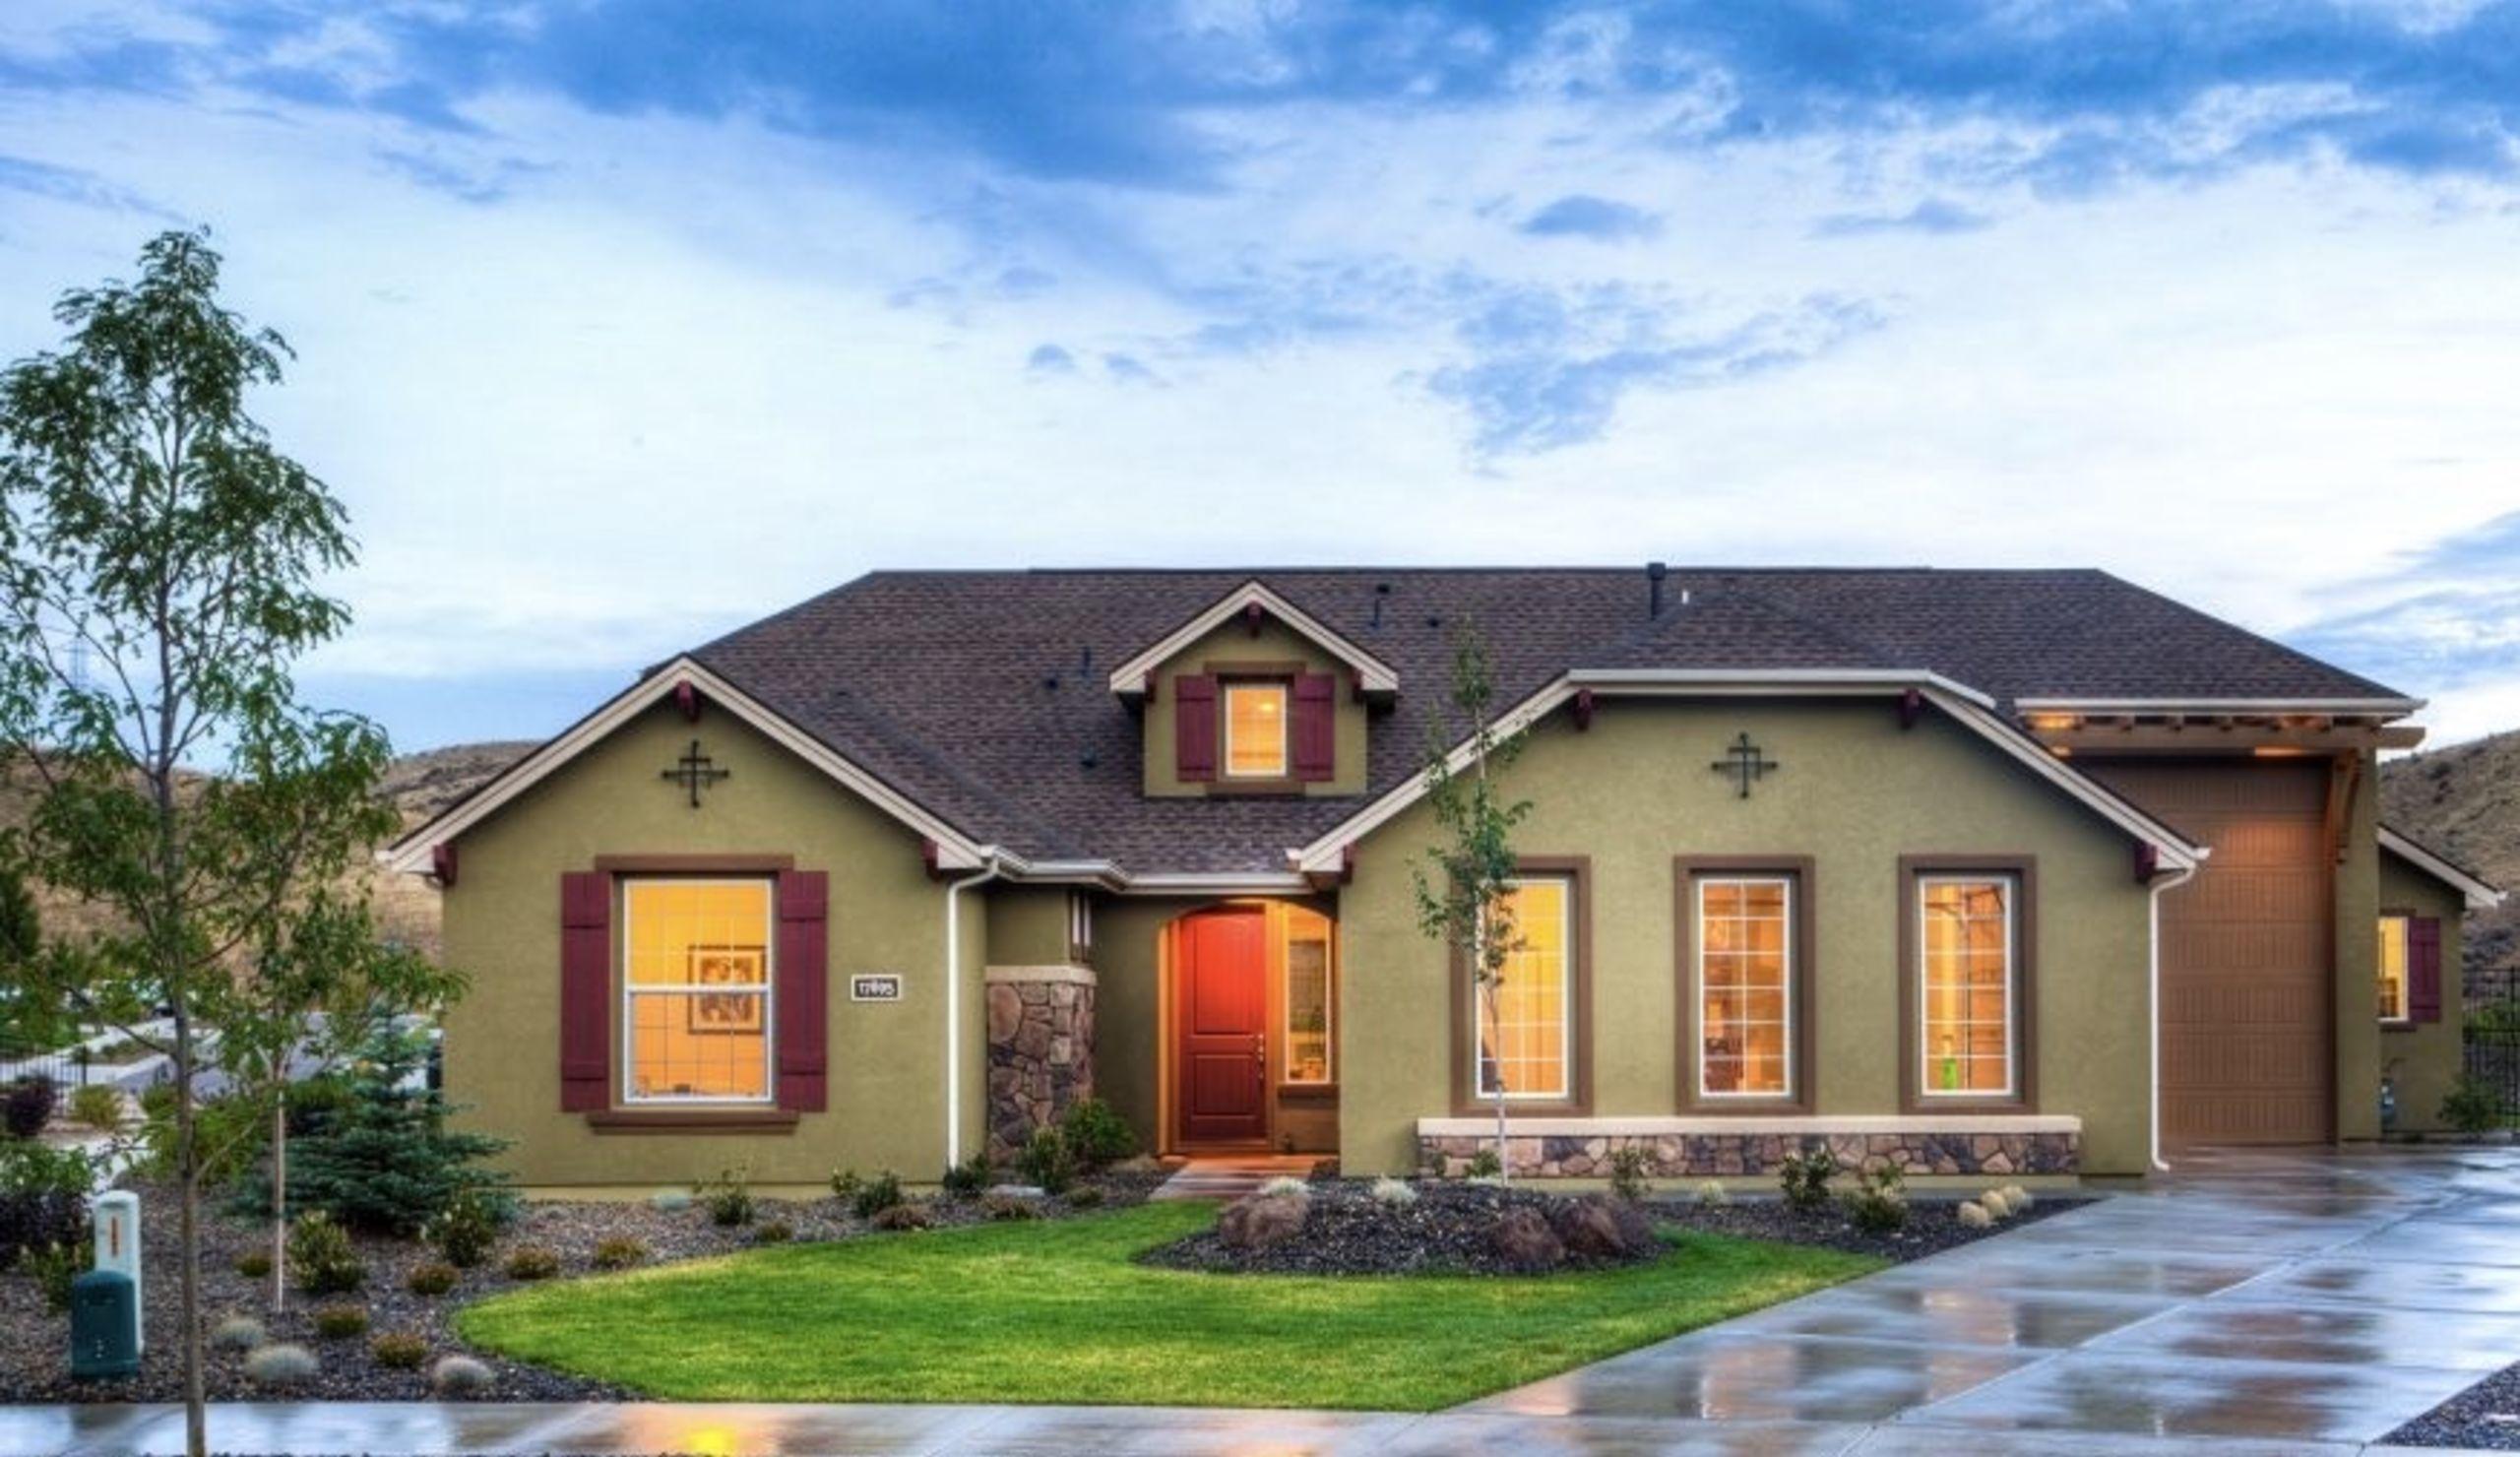 LAGUNA NIGUEL Homes for sale